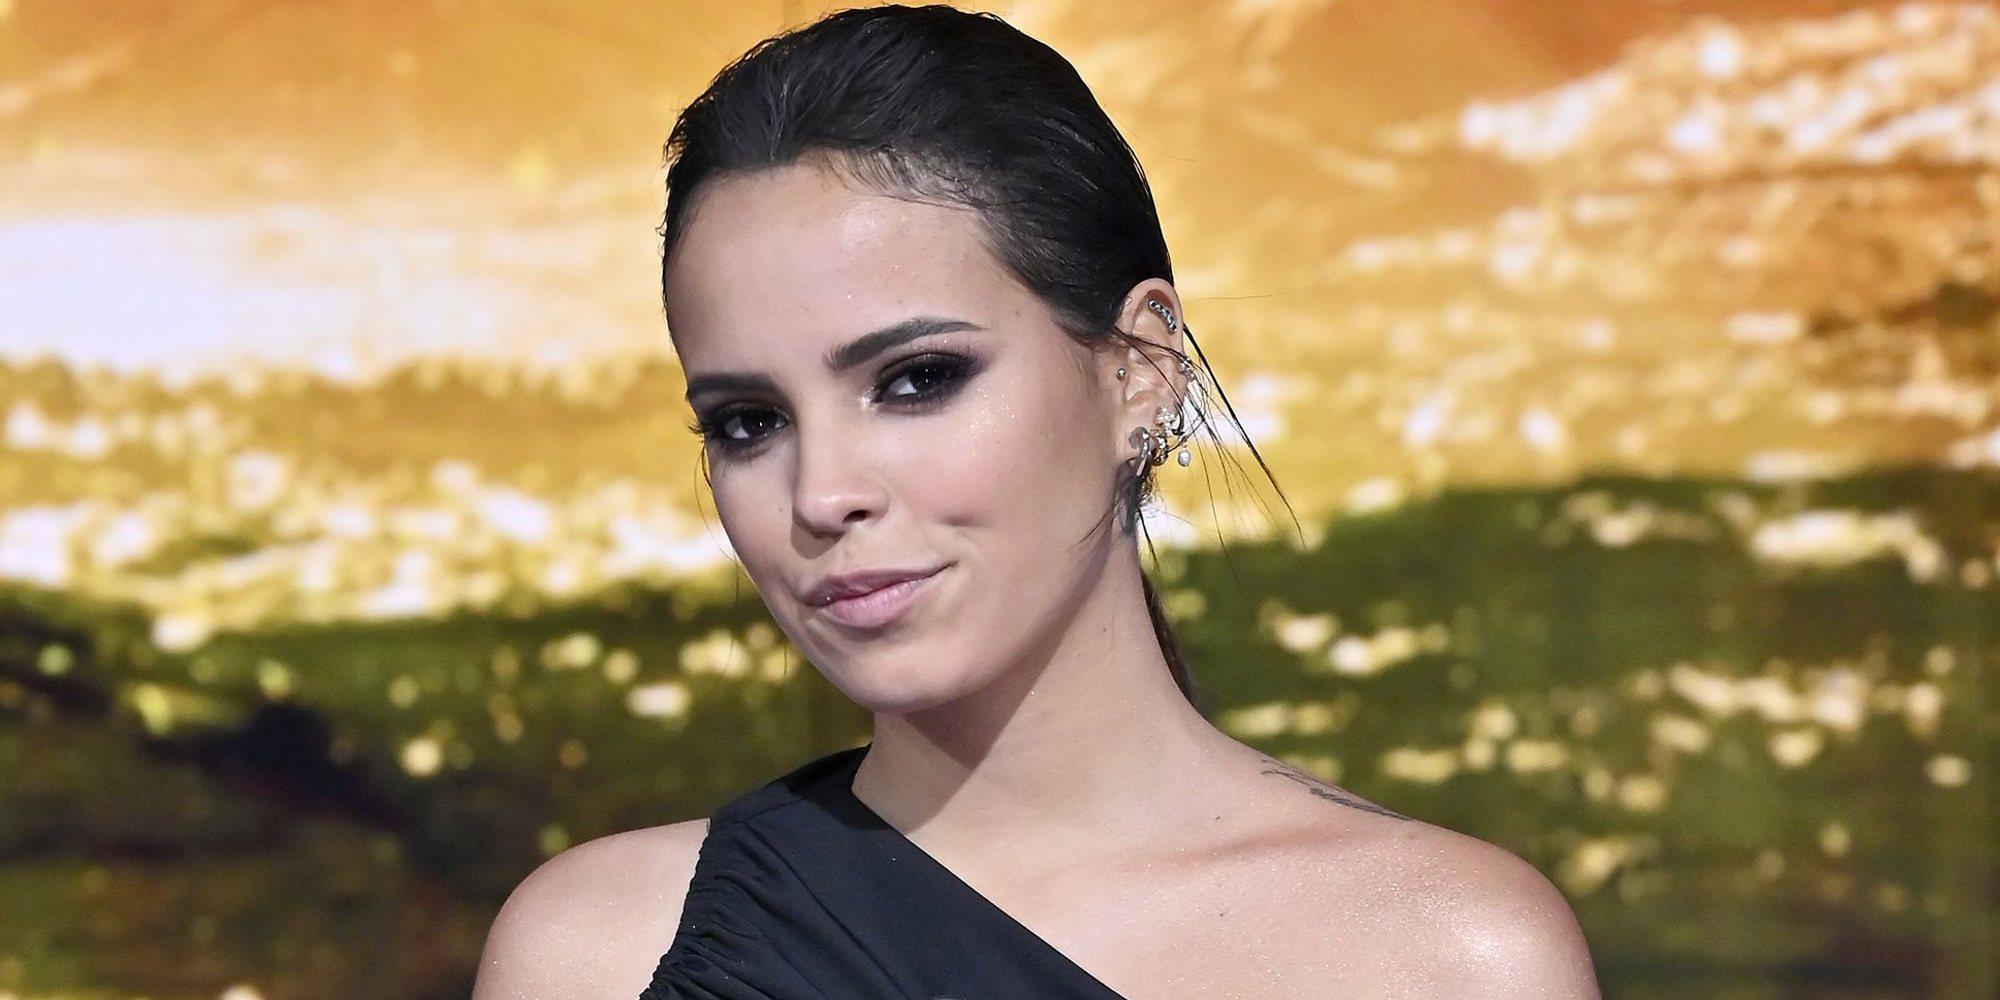 Gloria Camila se distancia cada vez más de Rocío Carrasco con su férrea defensa a Olga Moreno